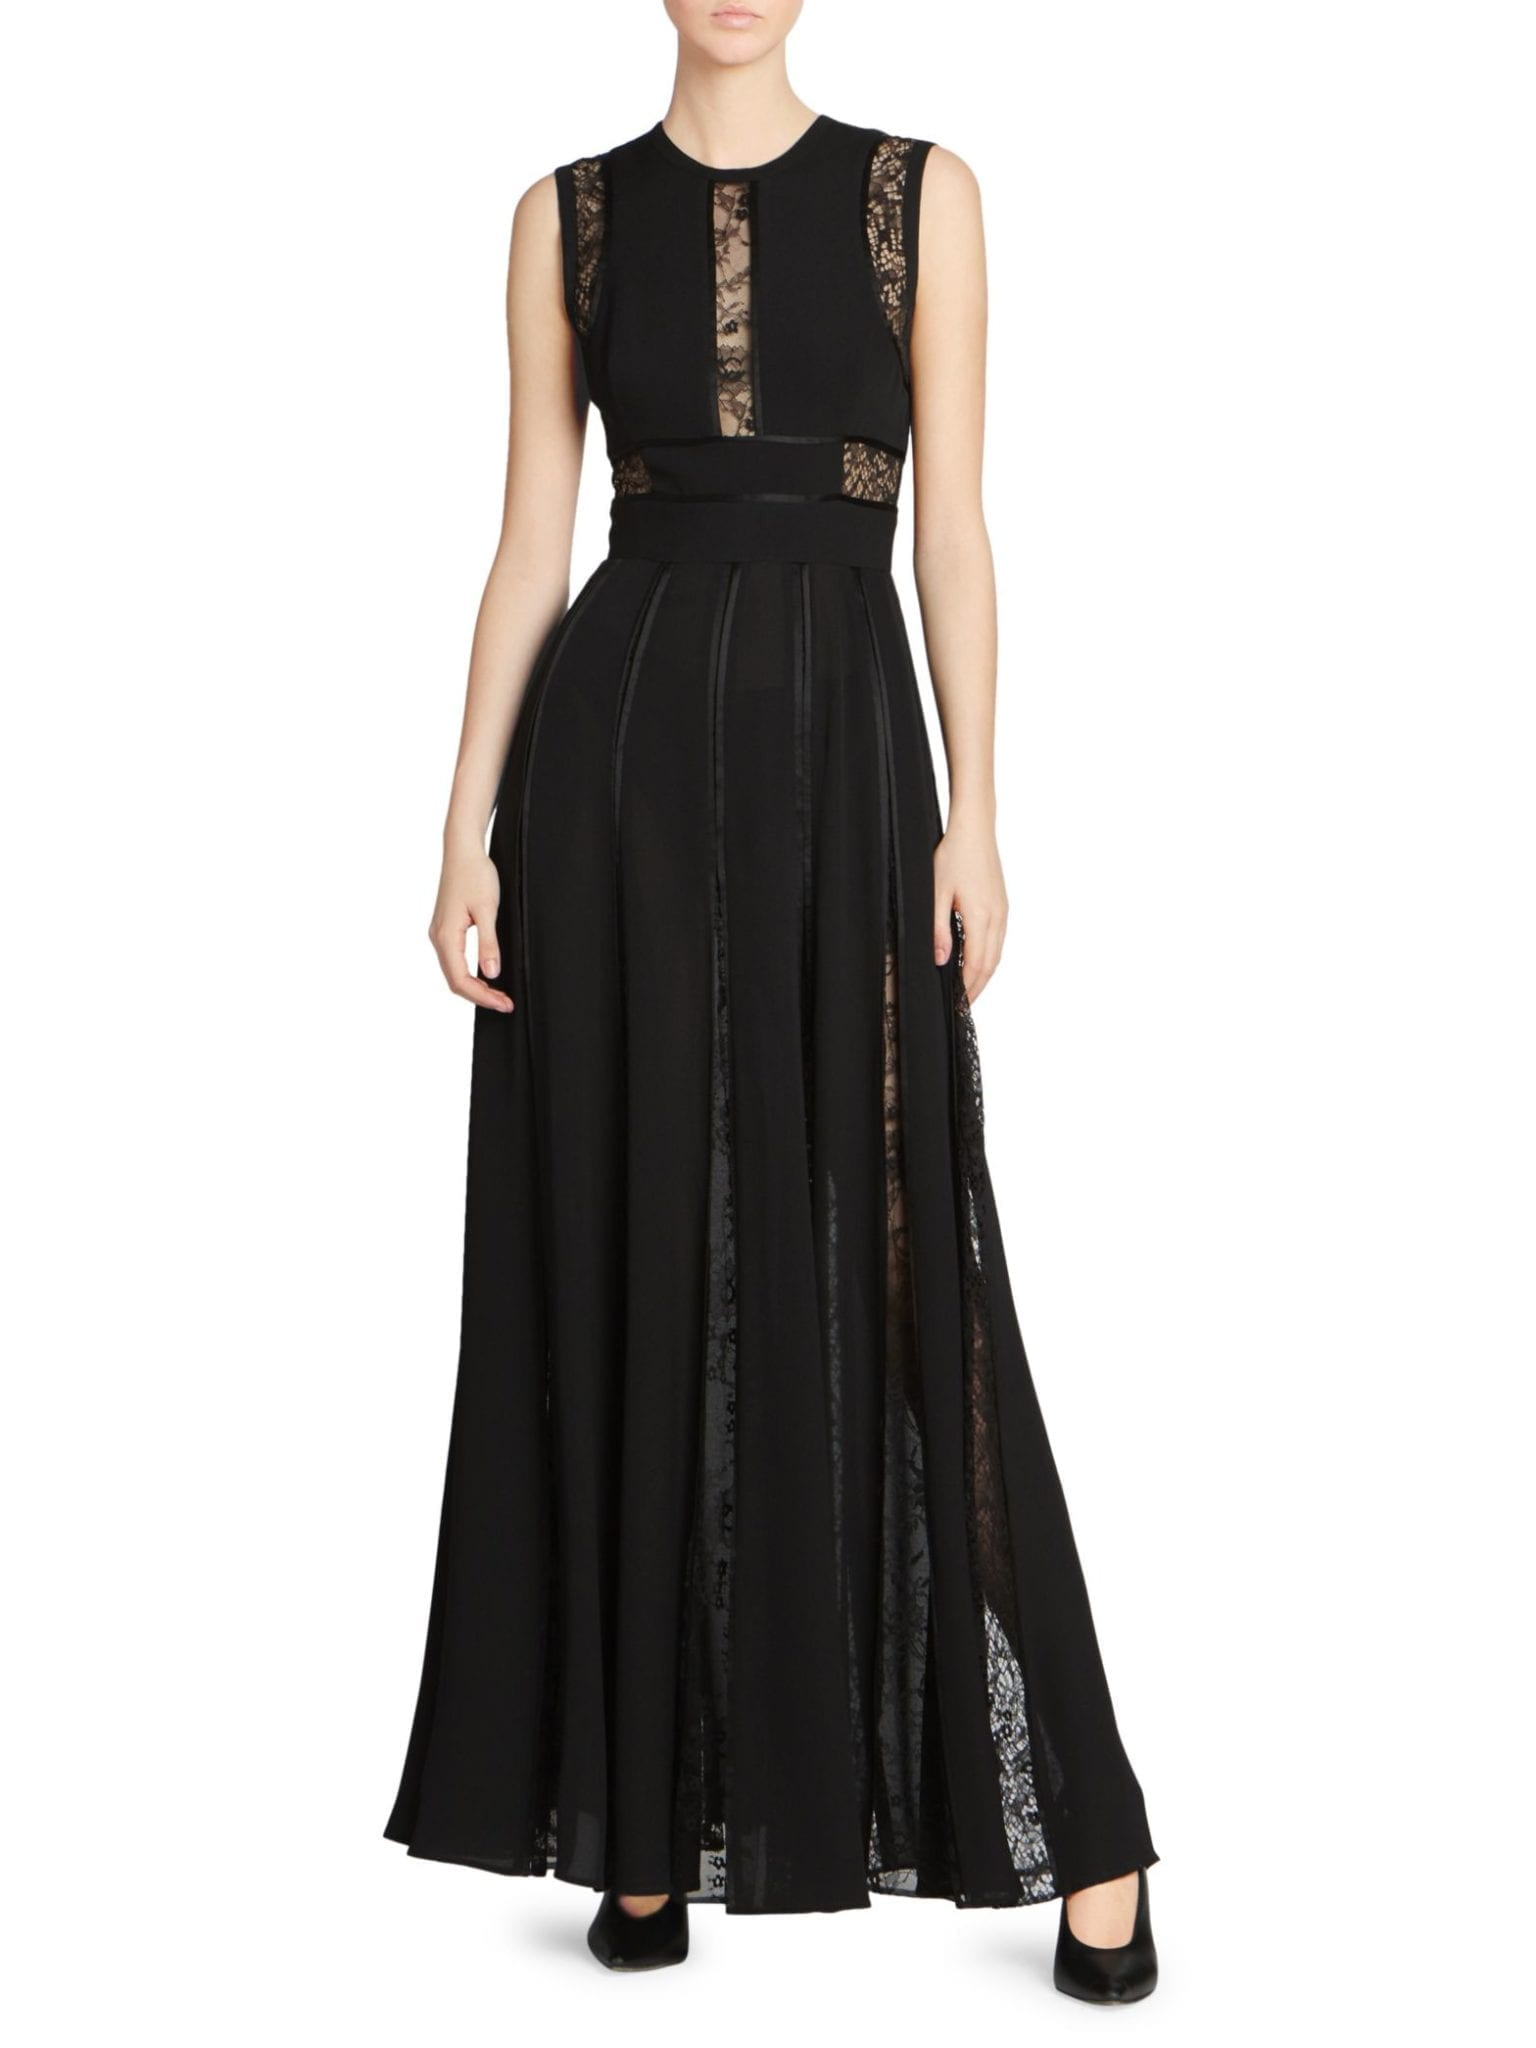 ELIE SAAB Sleeveless Lace Pleated Black Gown